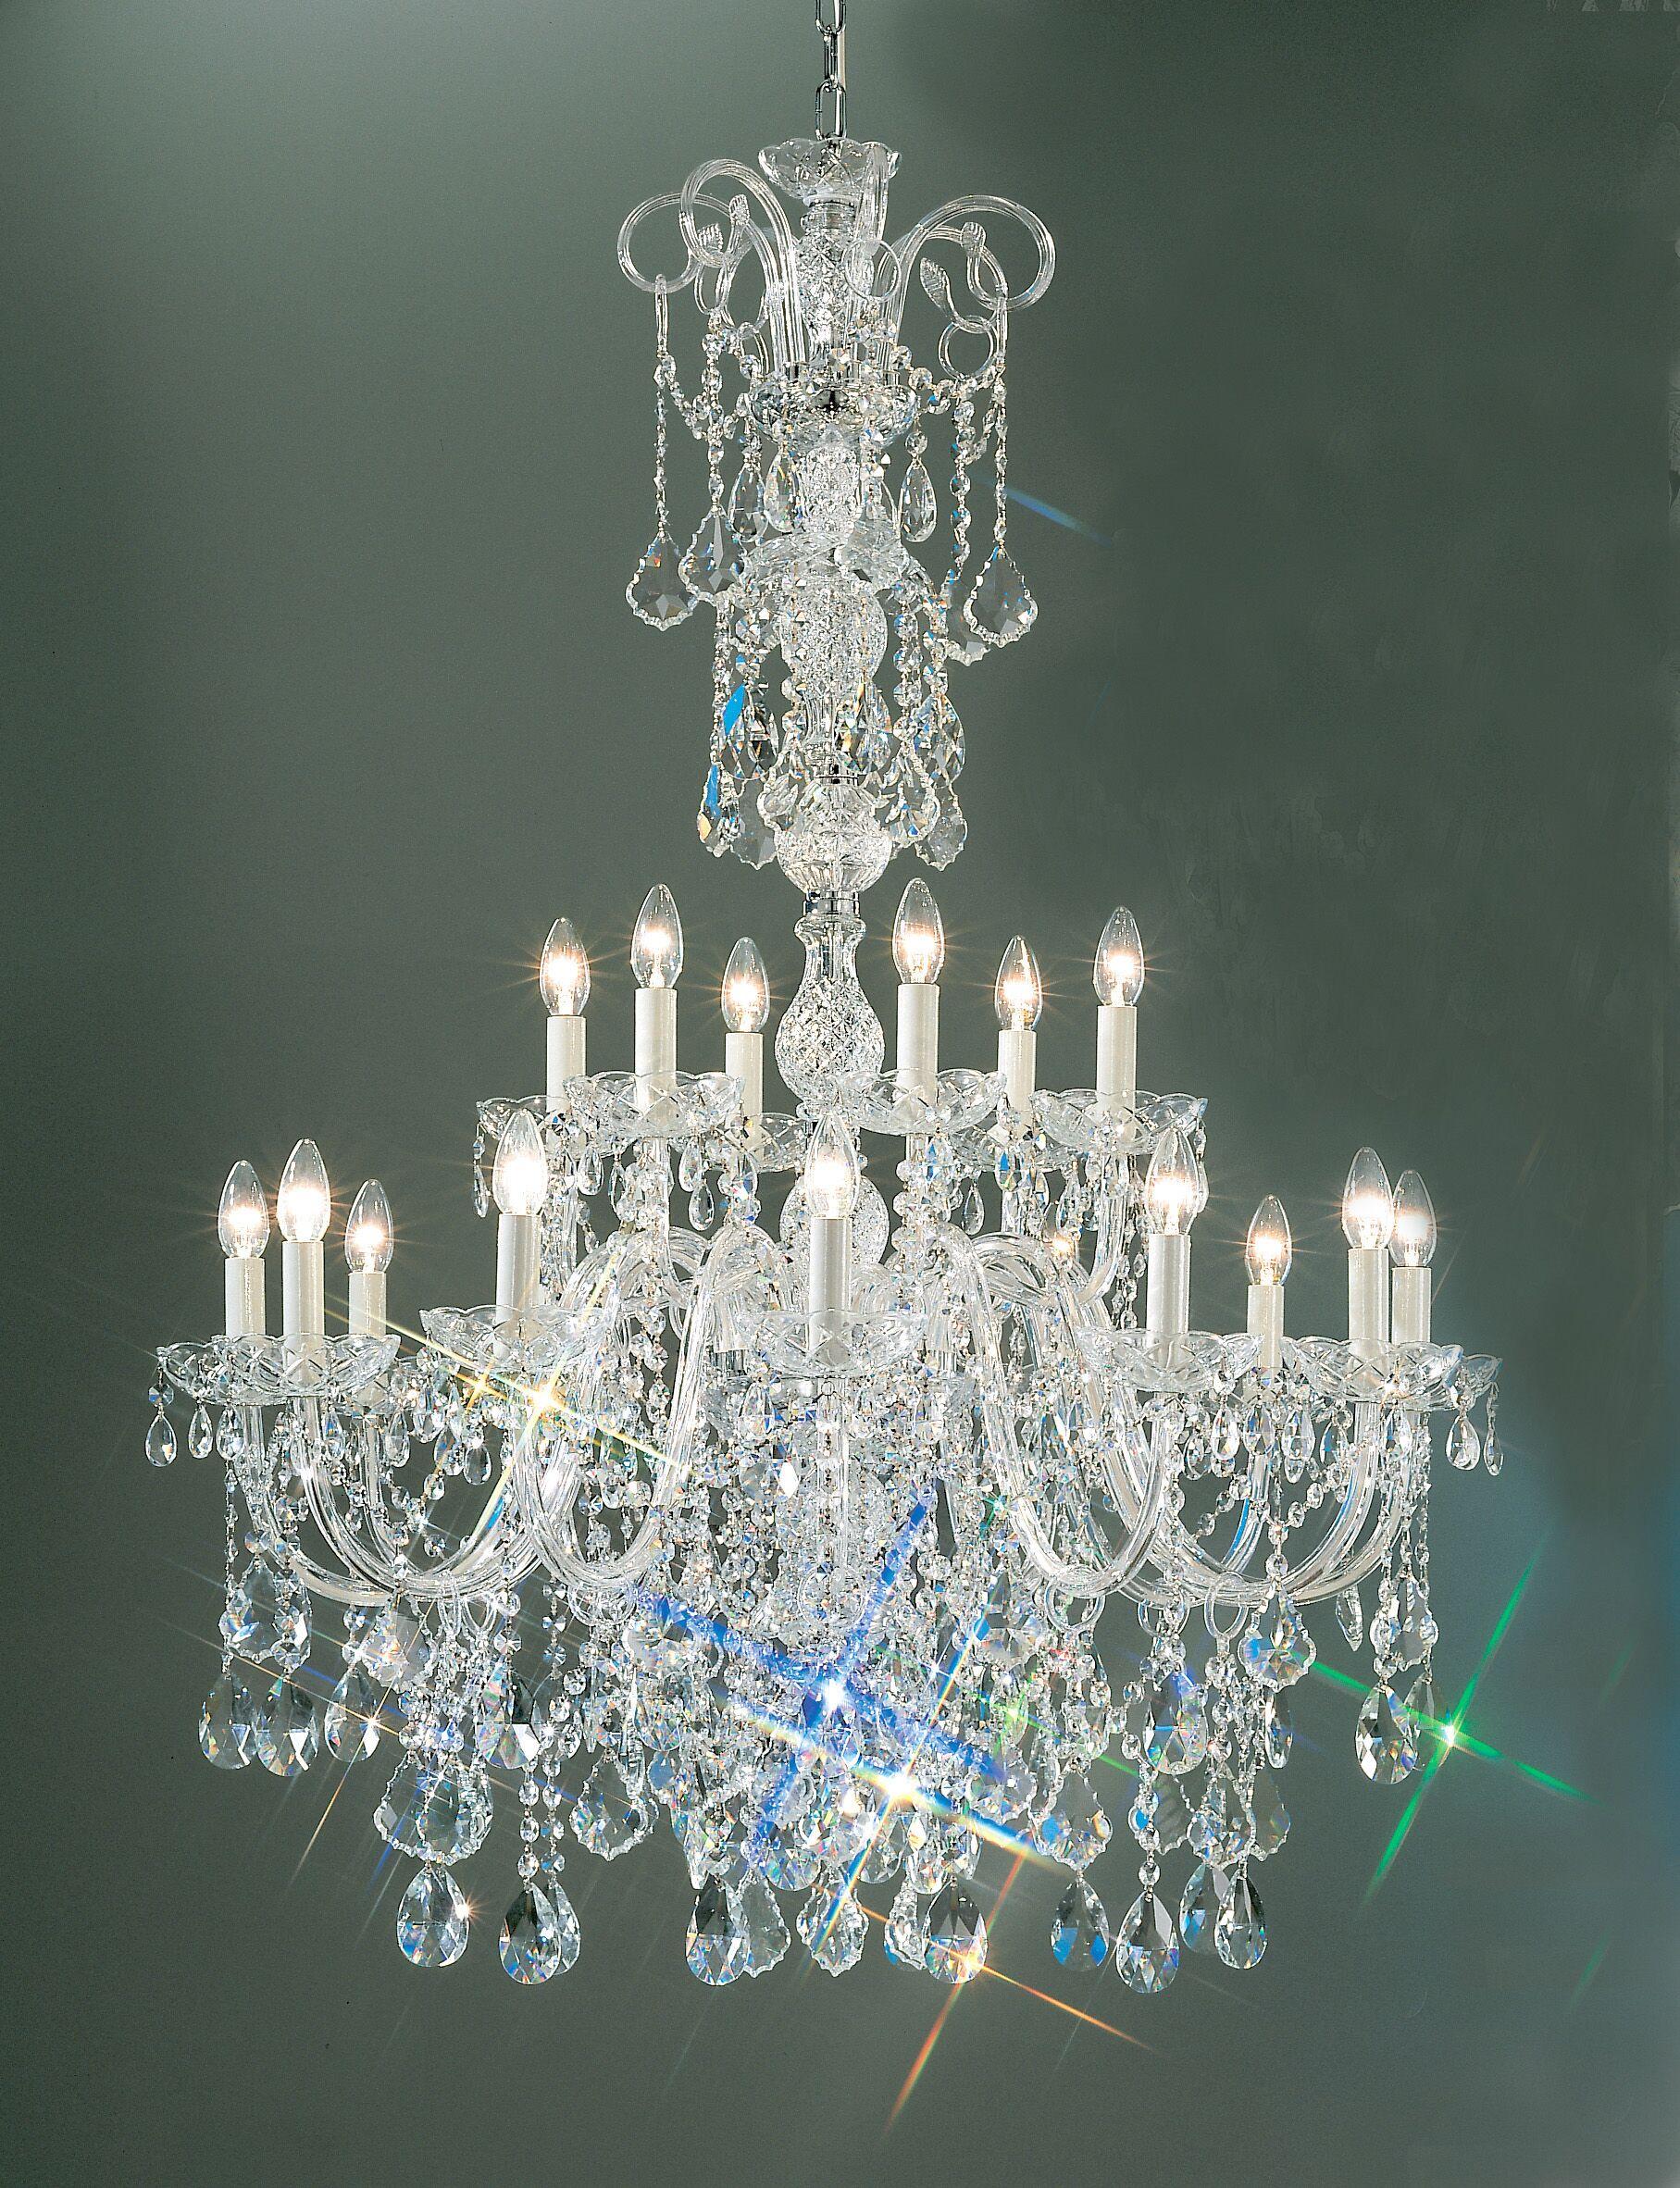 Bohemia 18-Light Candle Style Chandelier Crystal Type: Swarovski Elements, Finish: 24K Gold Plate